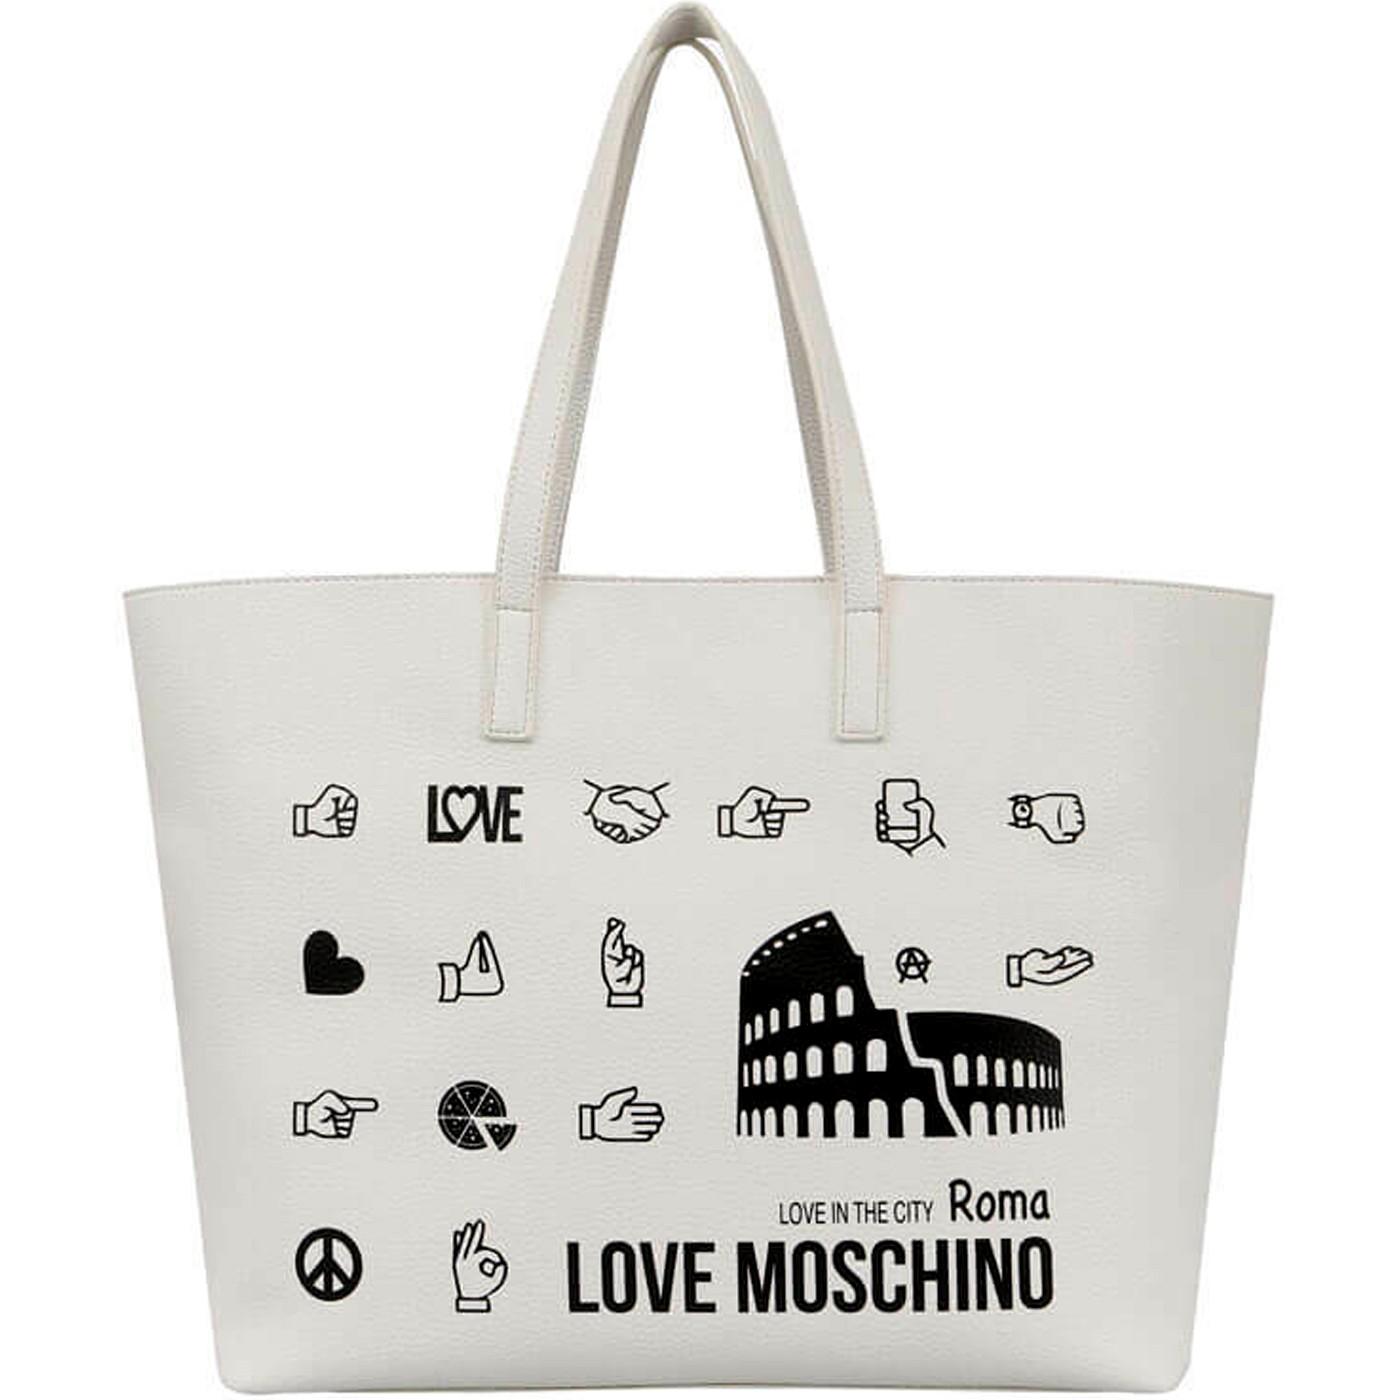 LOVE MOSCHINO Borsa shopping in ecopelle grande BIANCO PE 2019